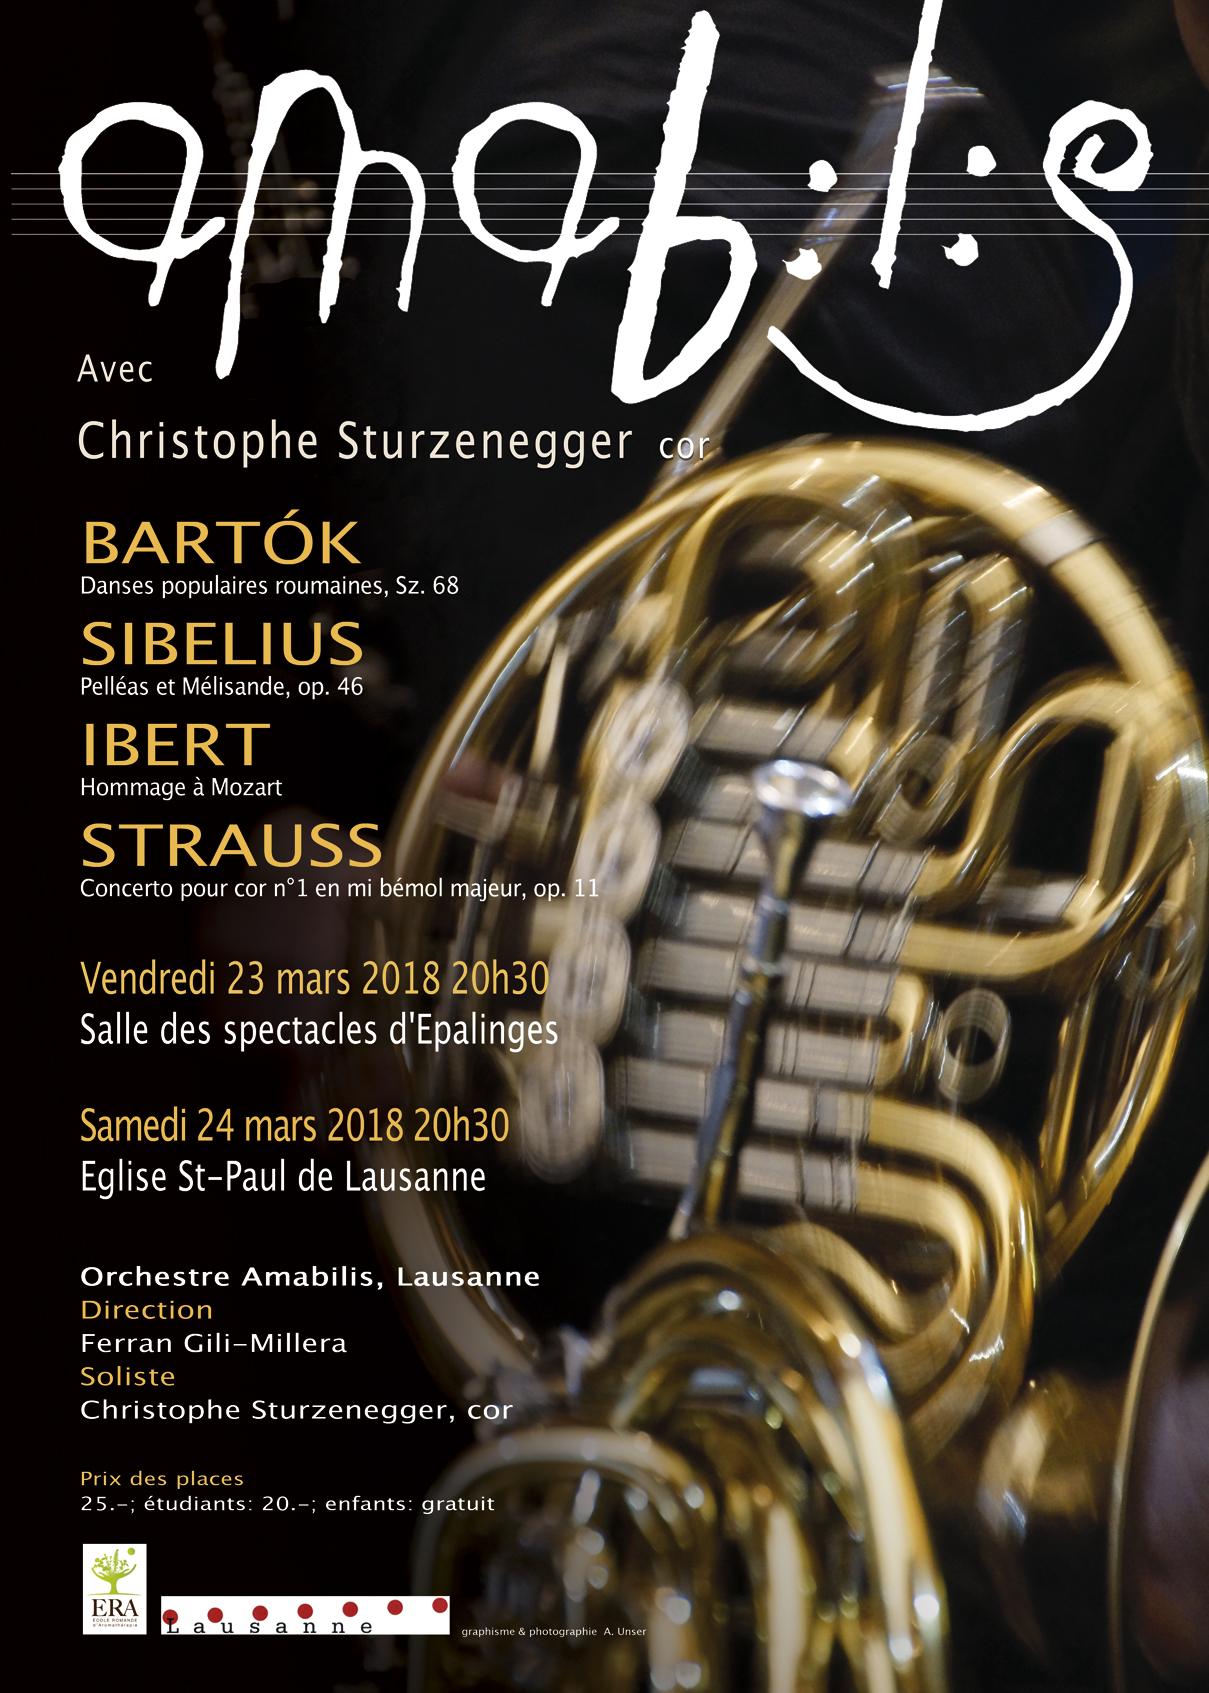 Amabilis joue Bartók, Sibelius, Ibert et Strauss